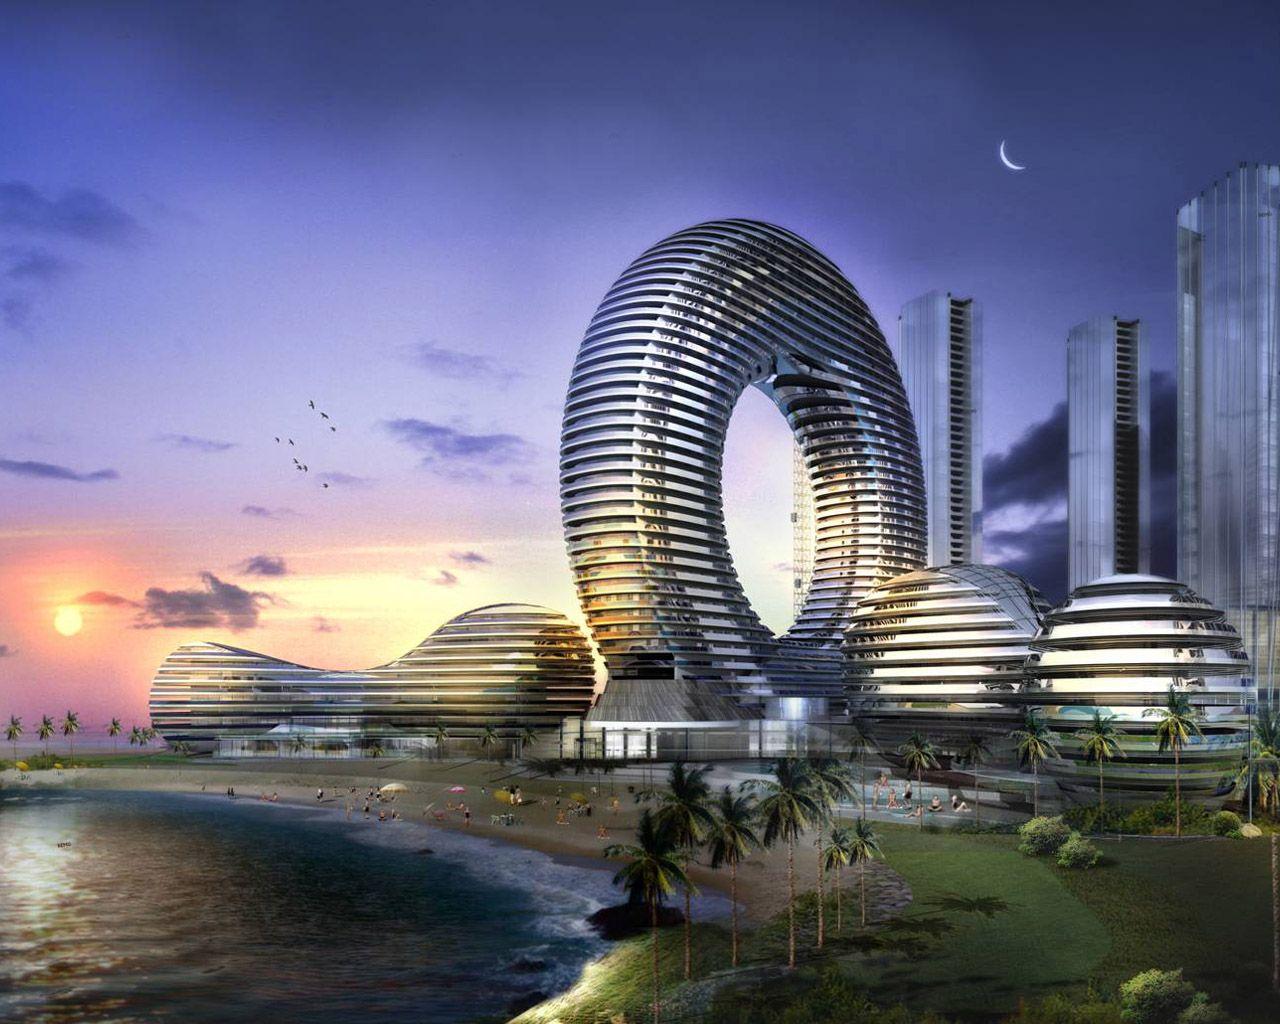 future building designs circular   Future Futuristic City ...